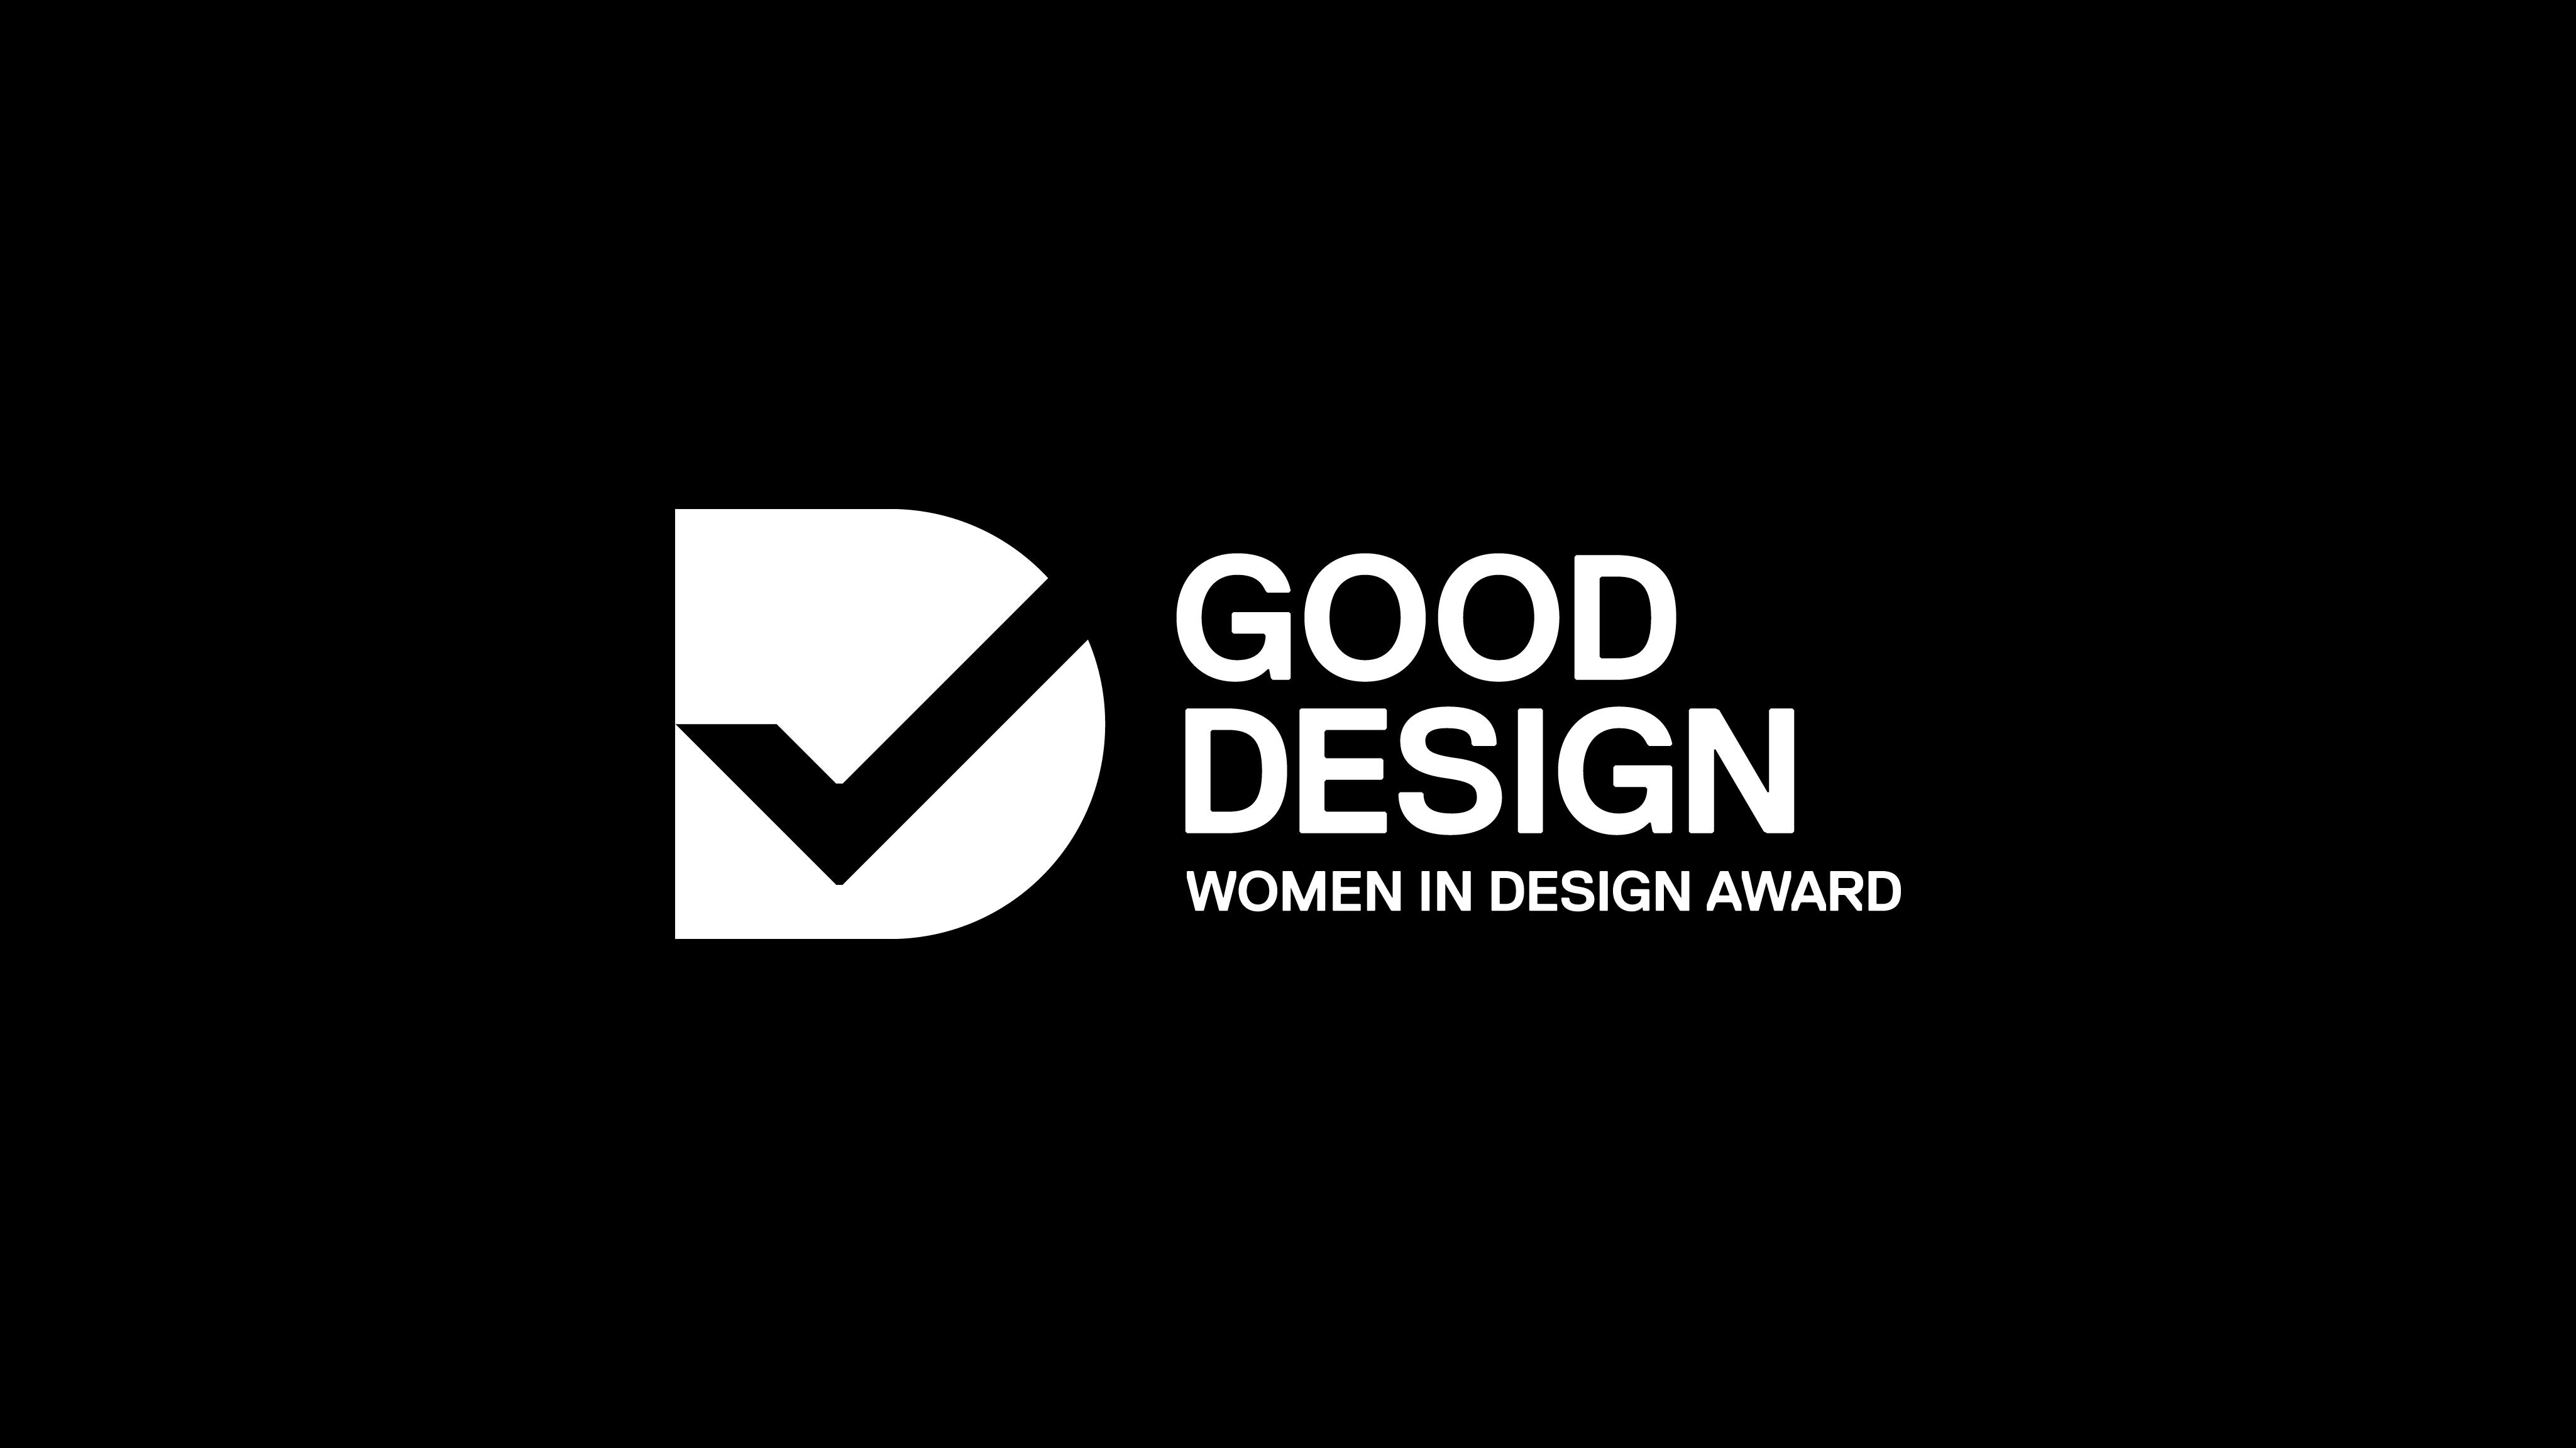 Women in Design Award